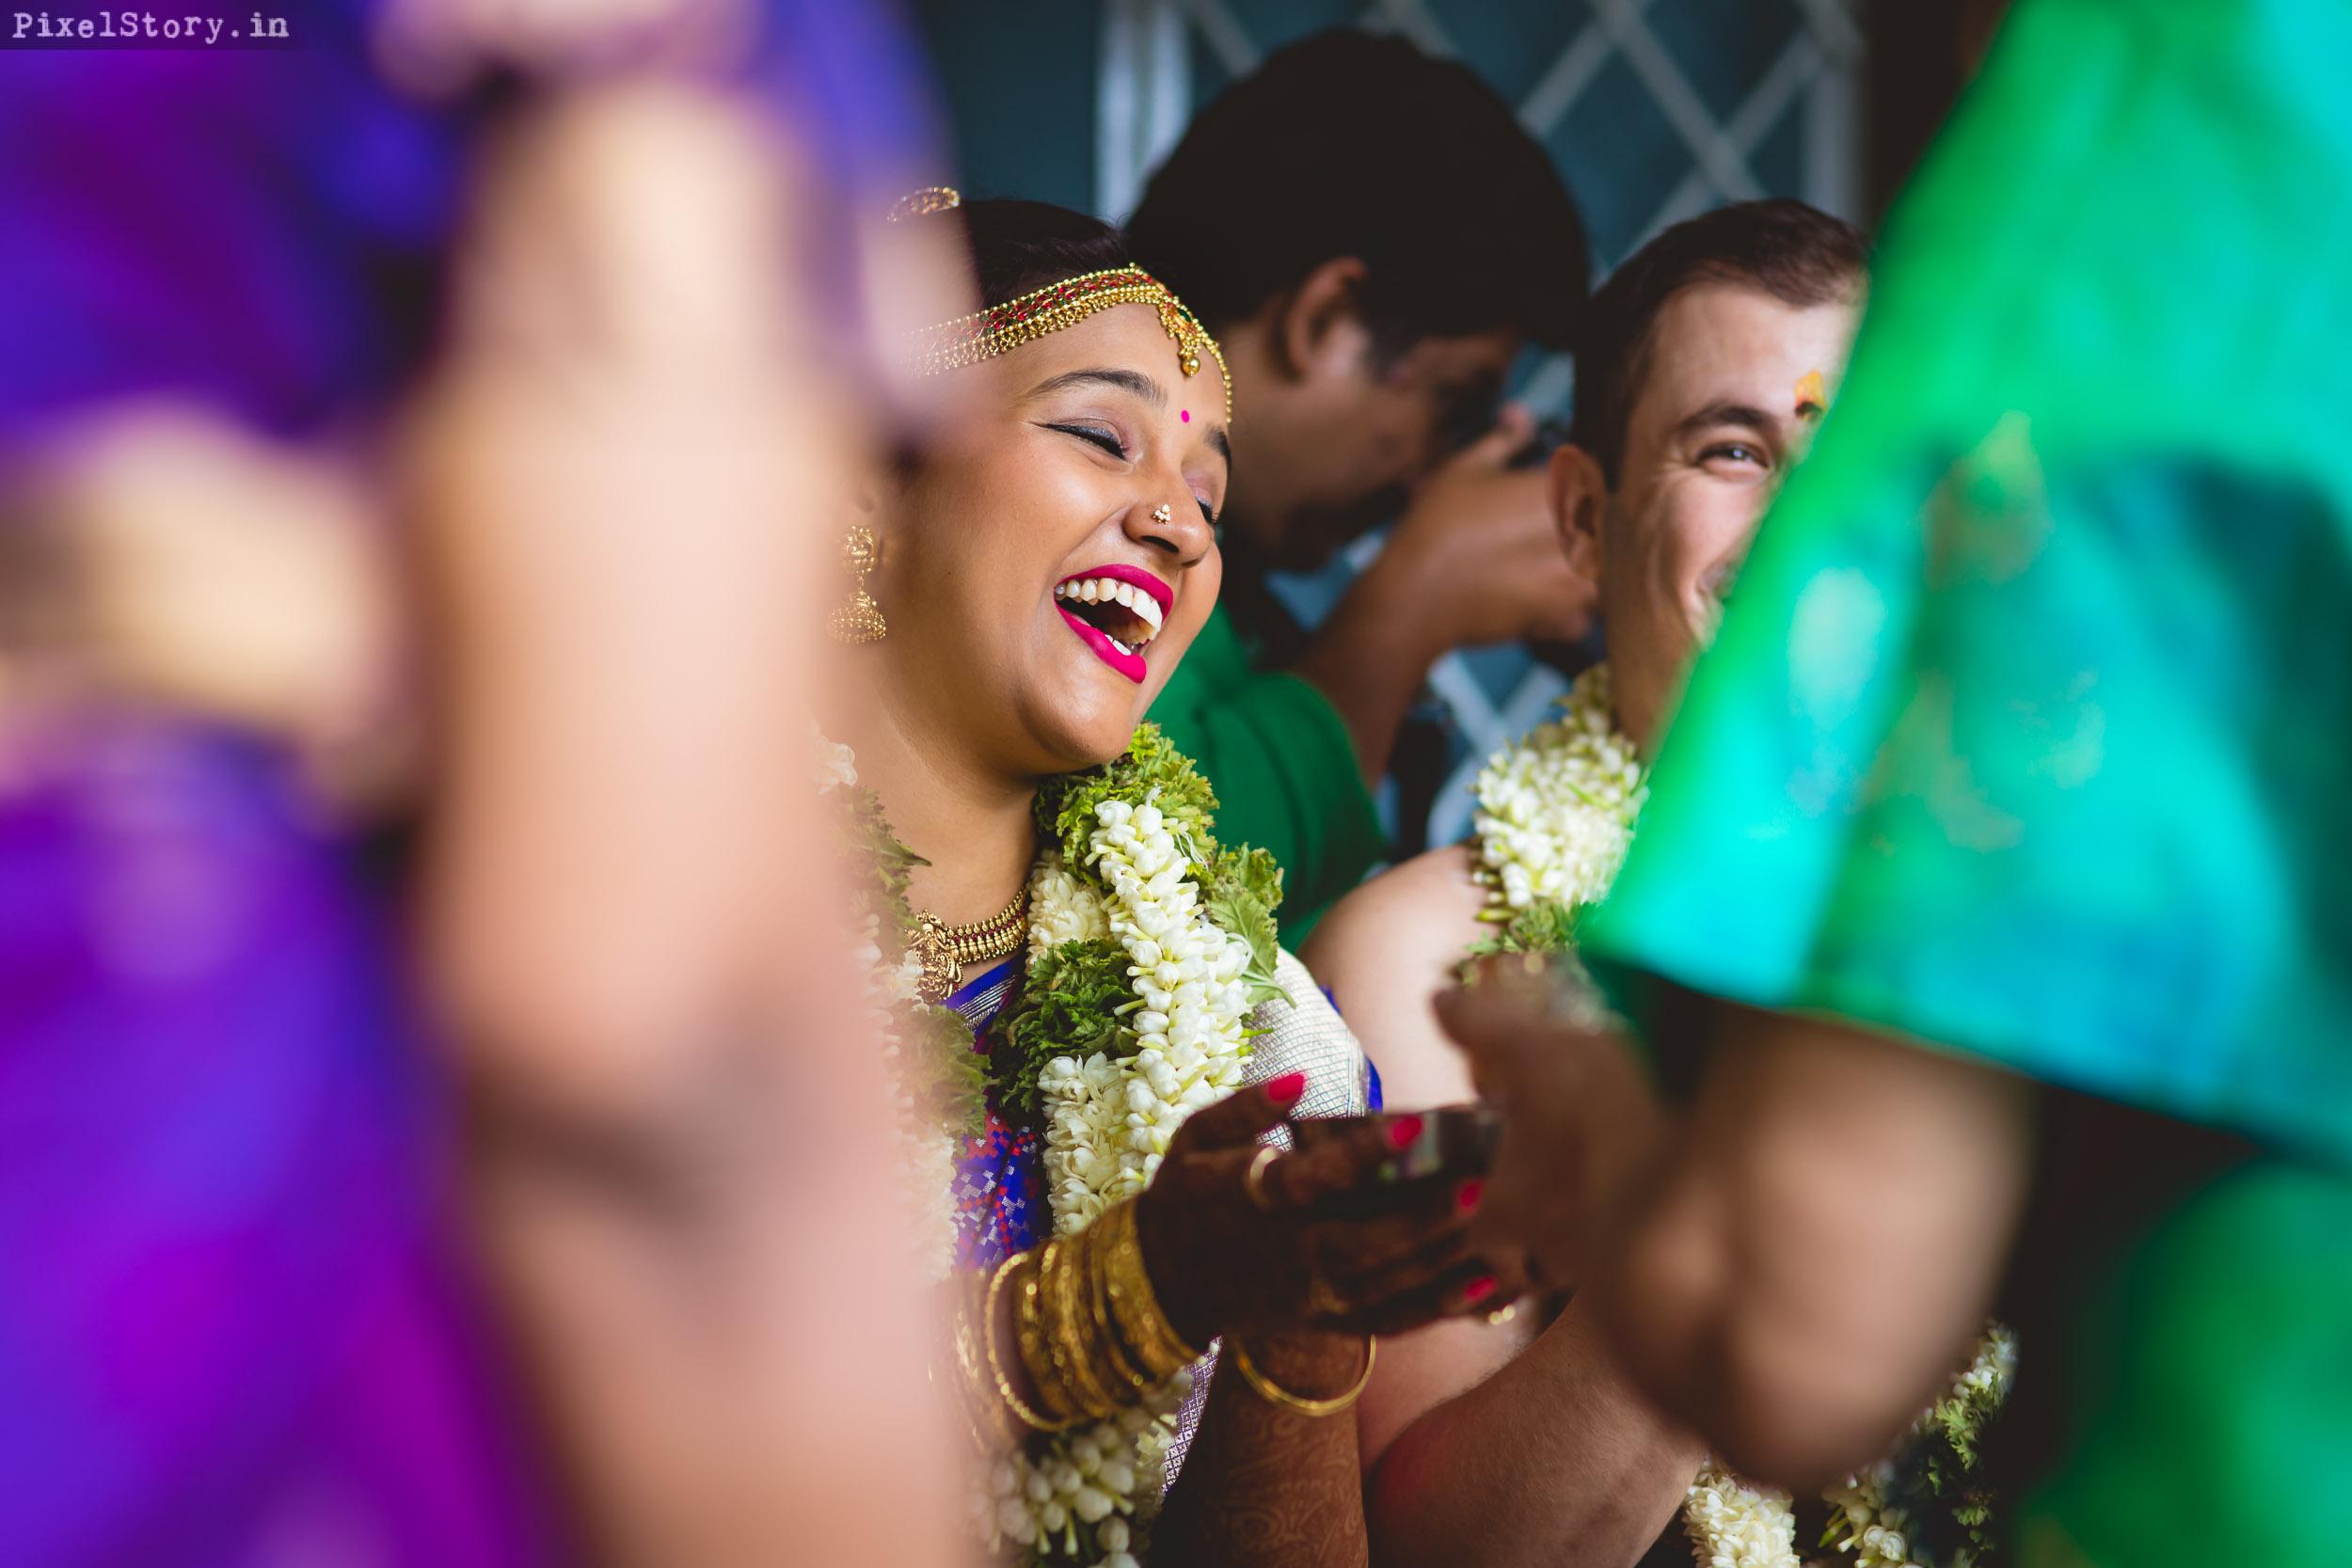 PixelStory-Jungle-Wedding-Photographer-Masinagudi-Indo-French040.jpg